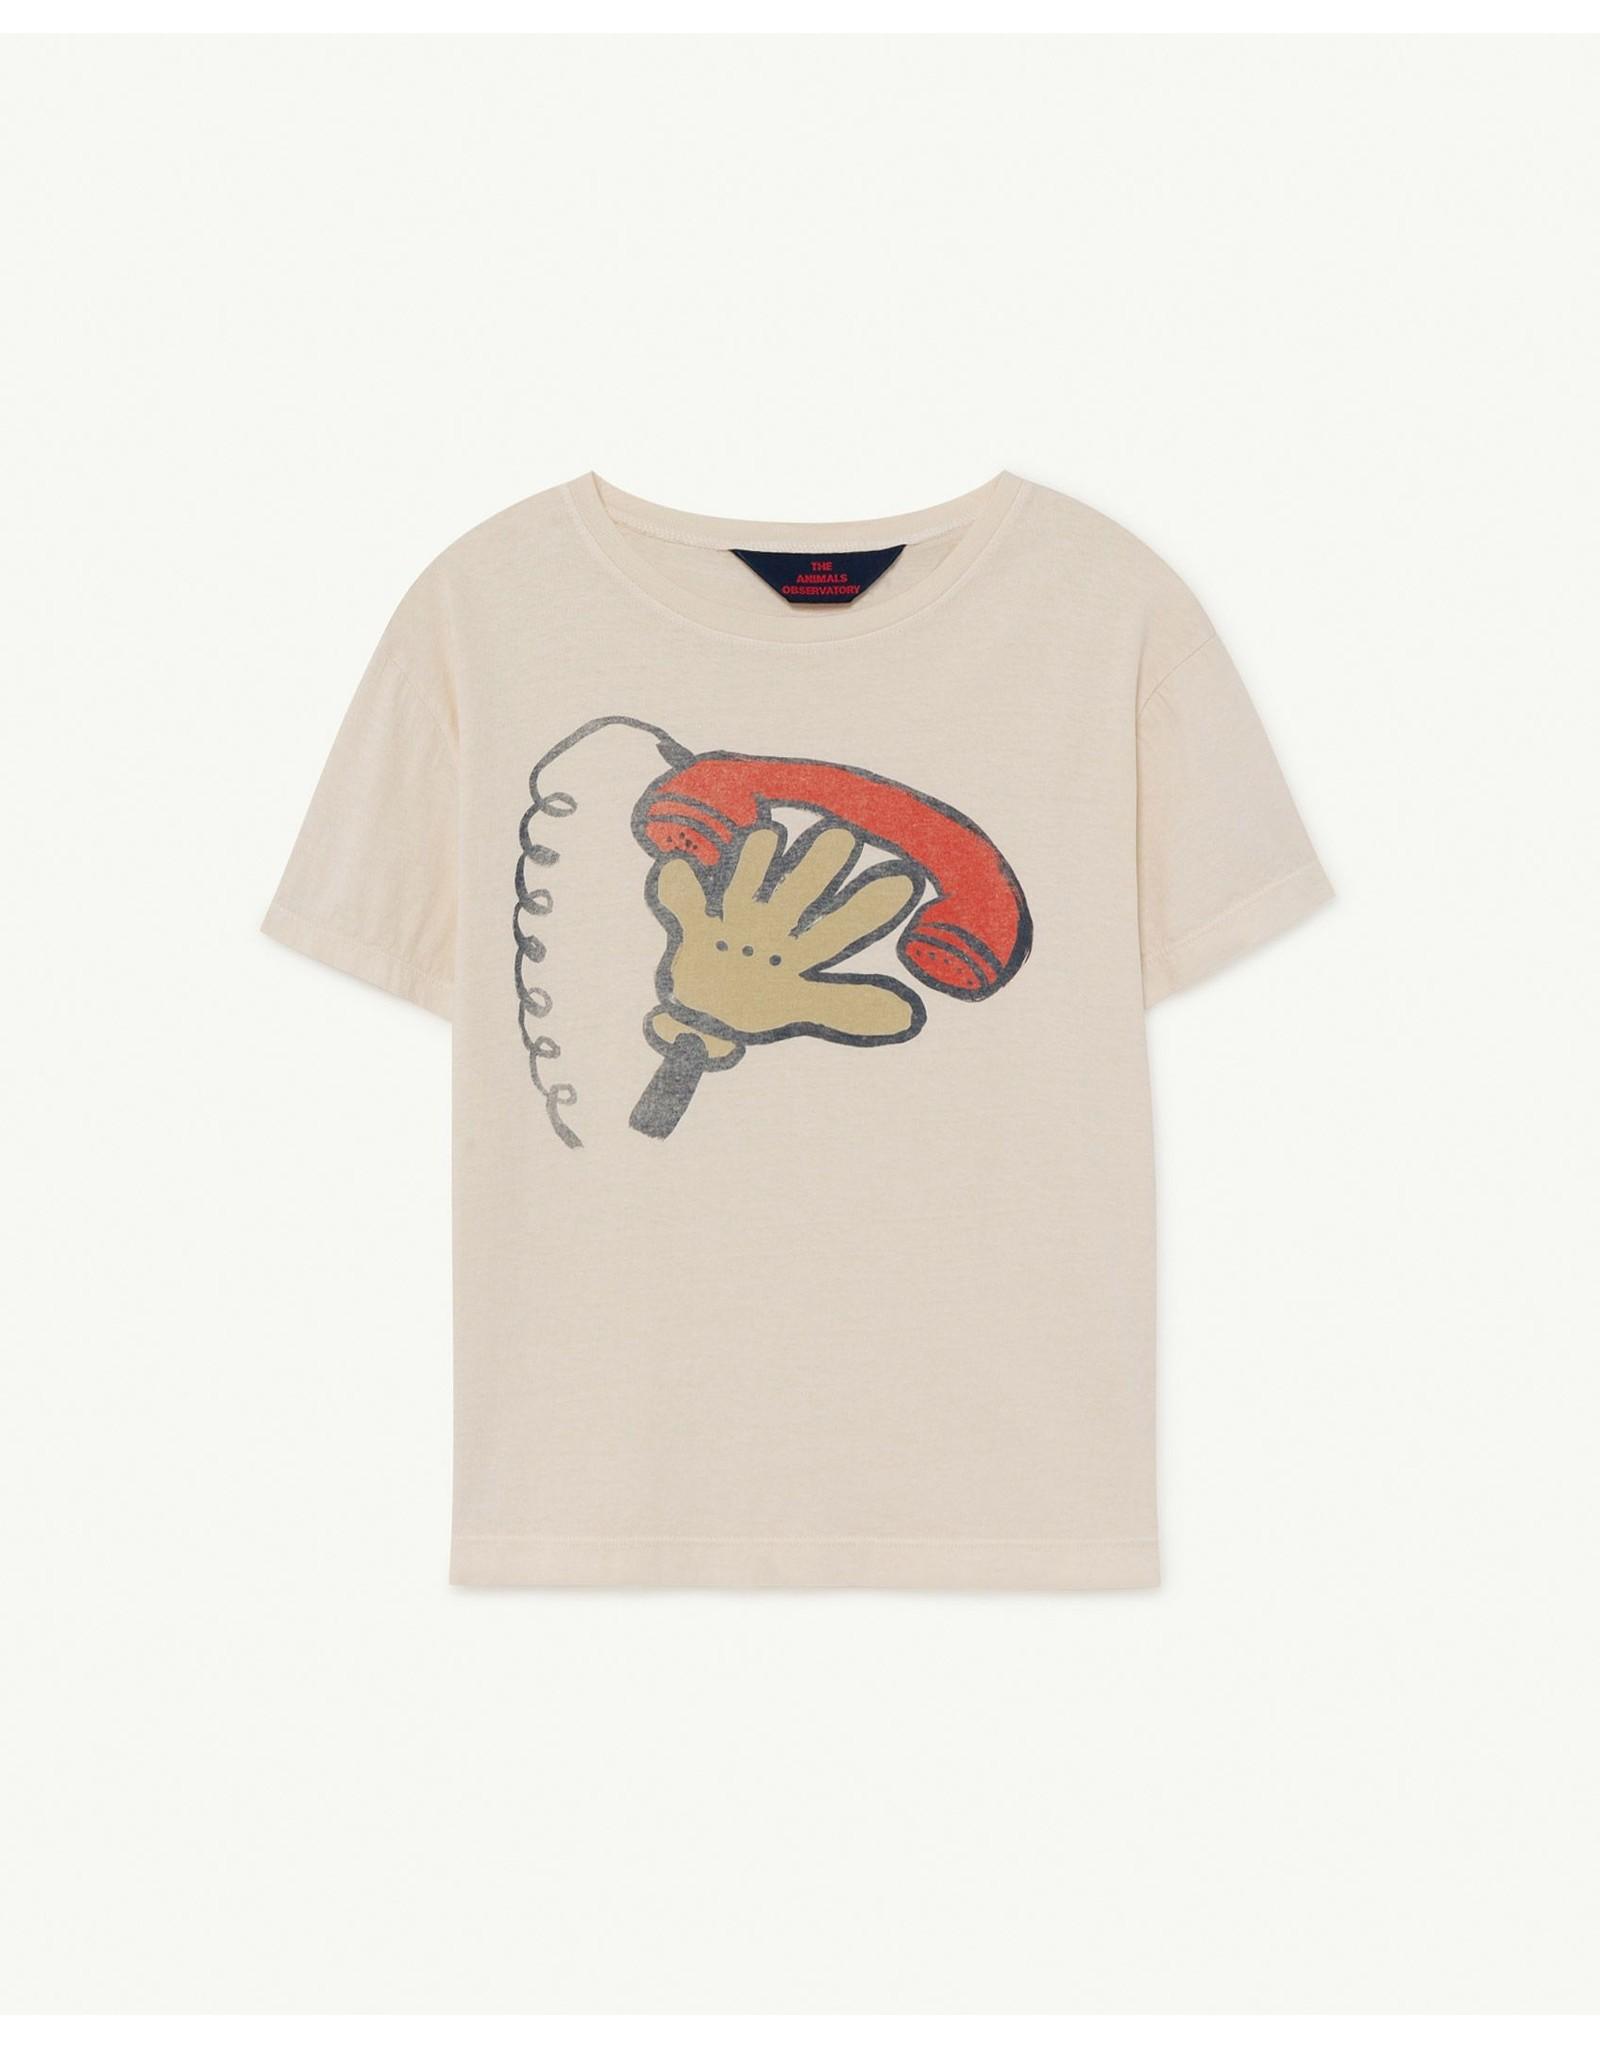 TAO SS21001 Rooster T-shirt